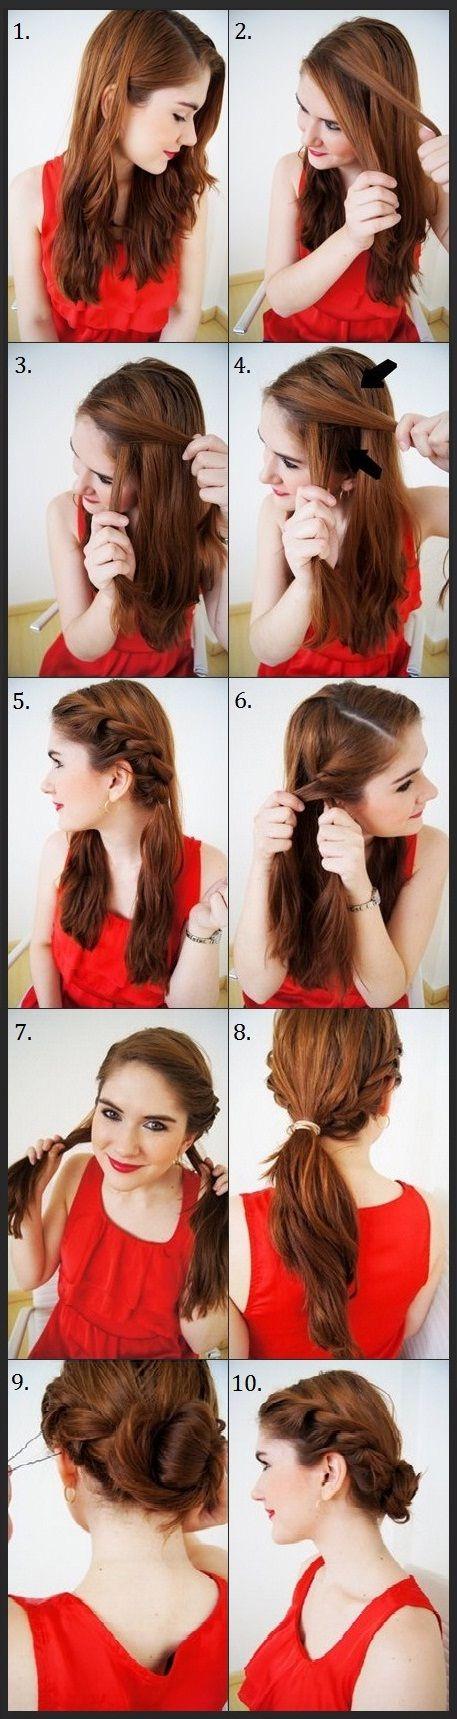 The Twisty Updo hair tutorial